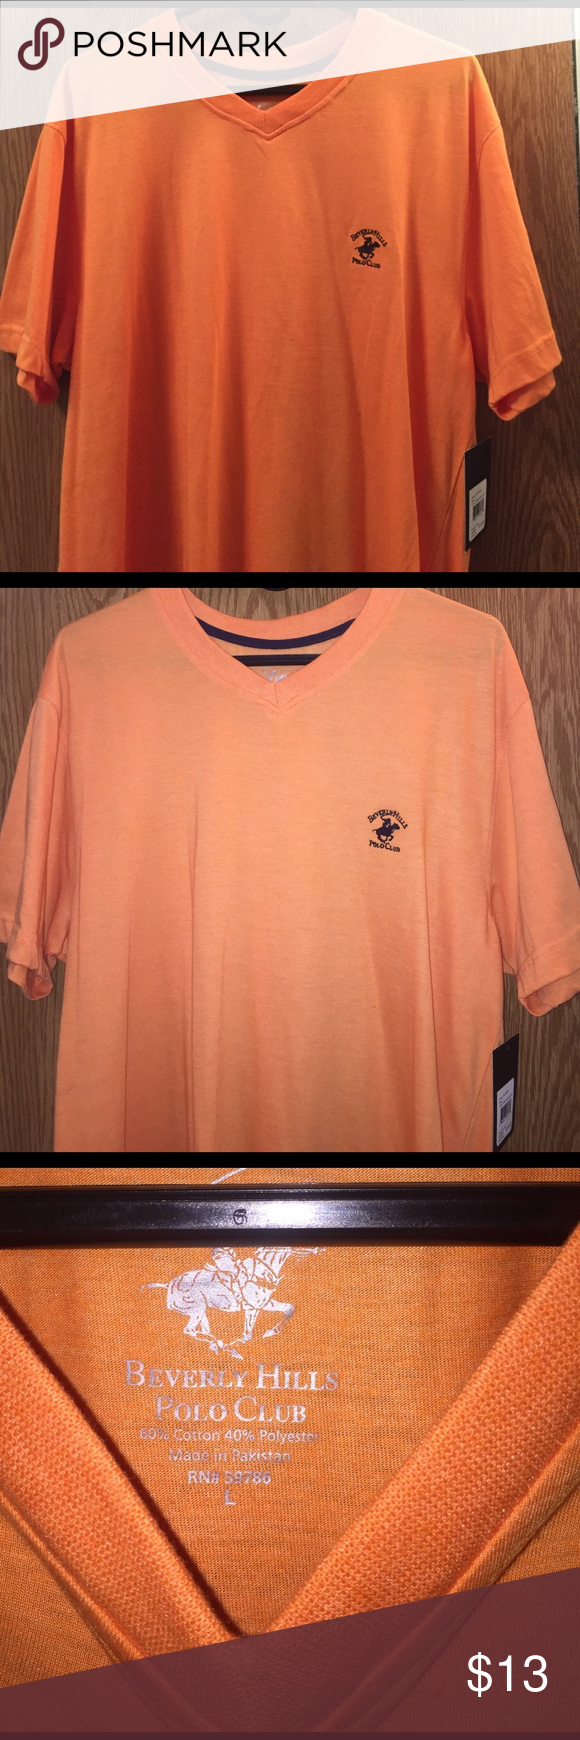 38a97758835 Beverly Hills Polo Club Womens T Shirts